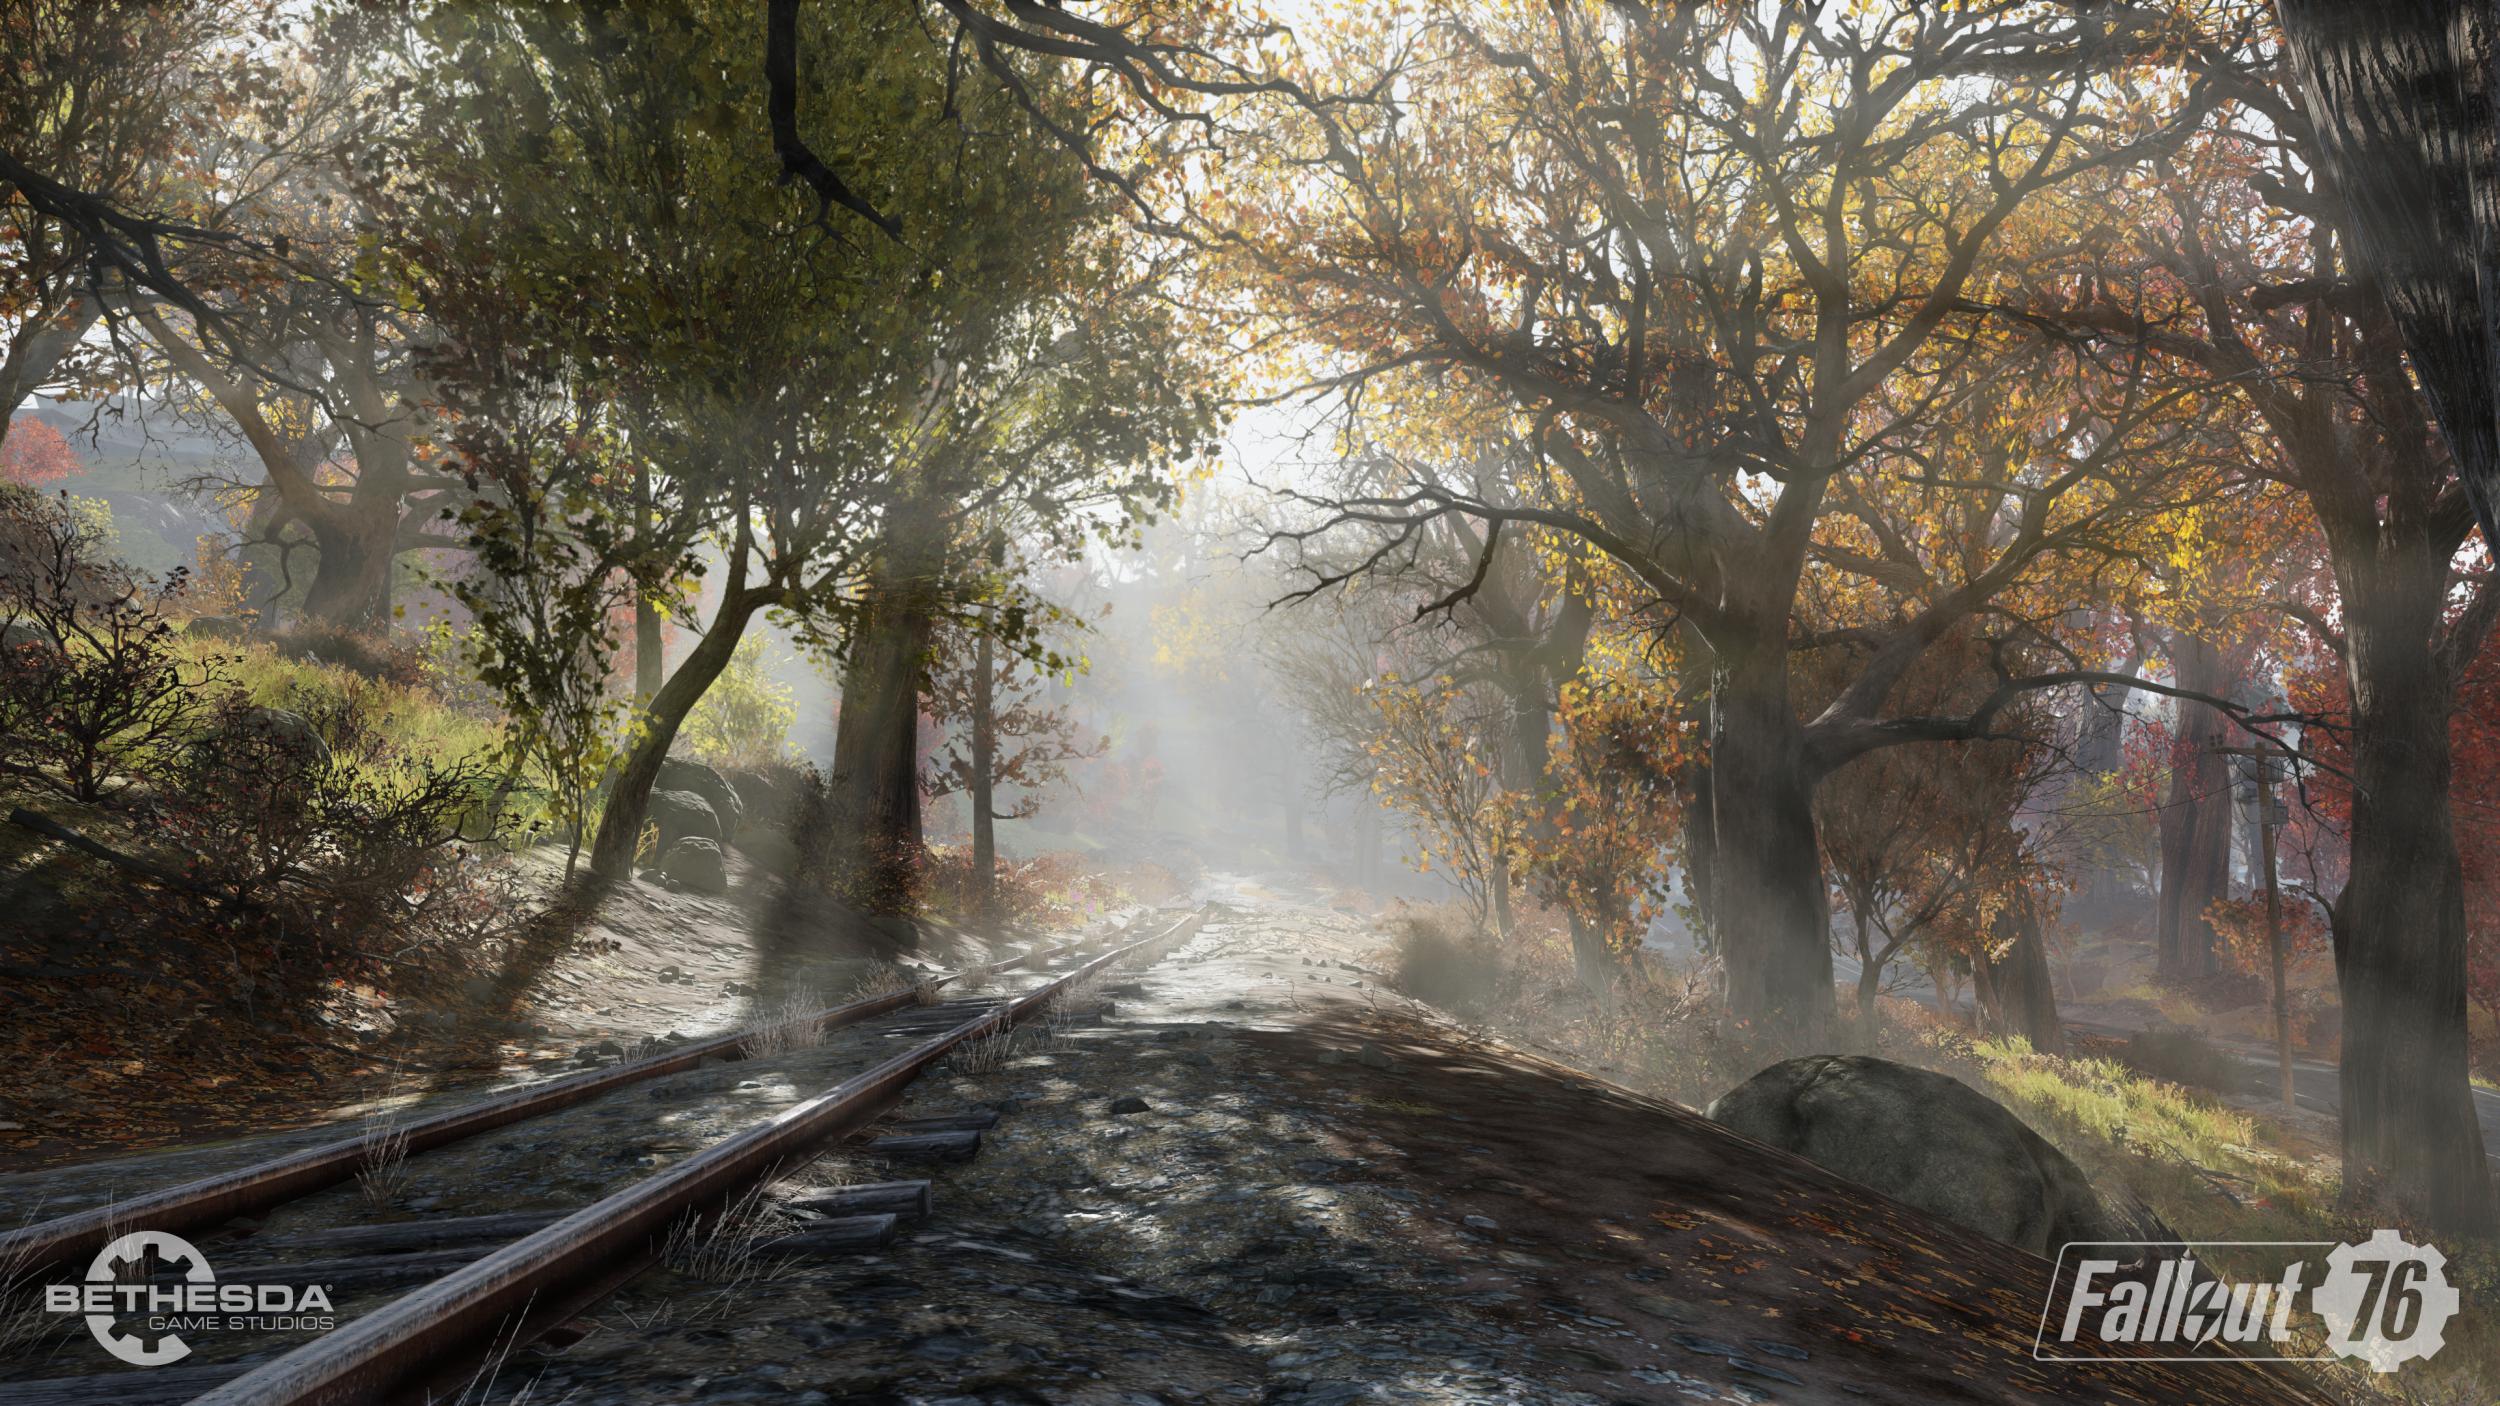 Fallout 76 Vendors guide